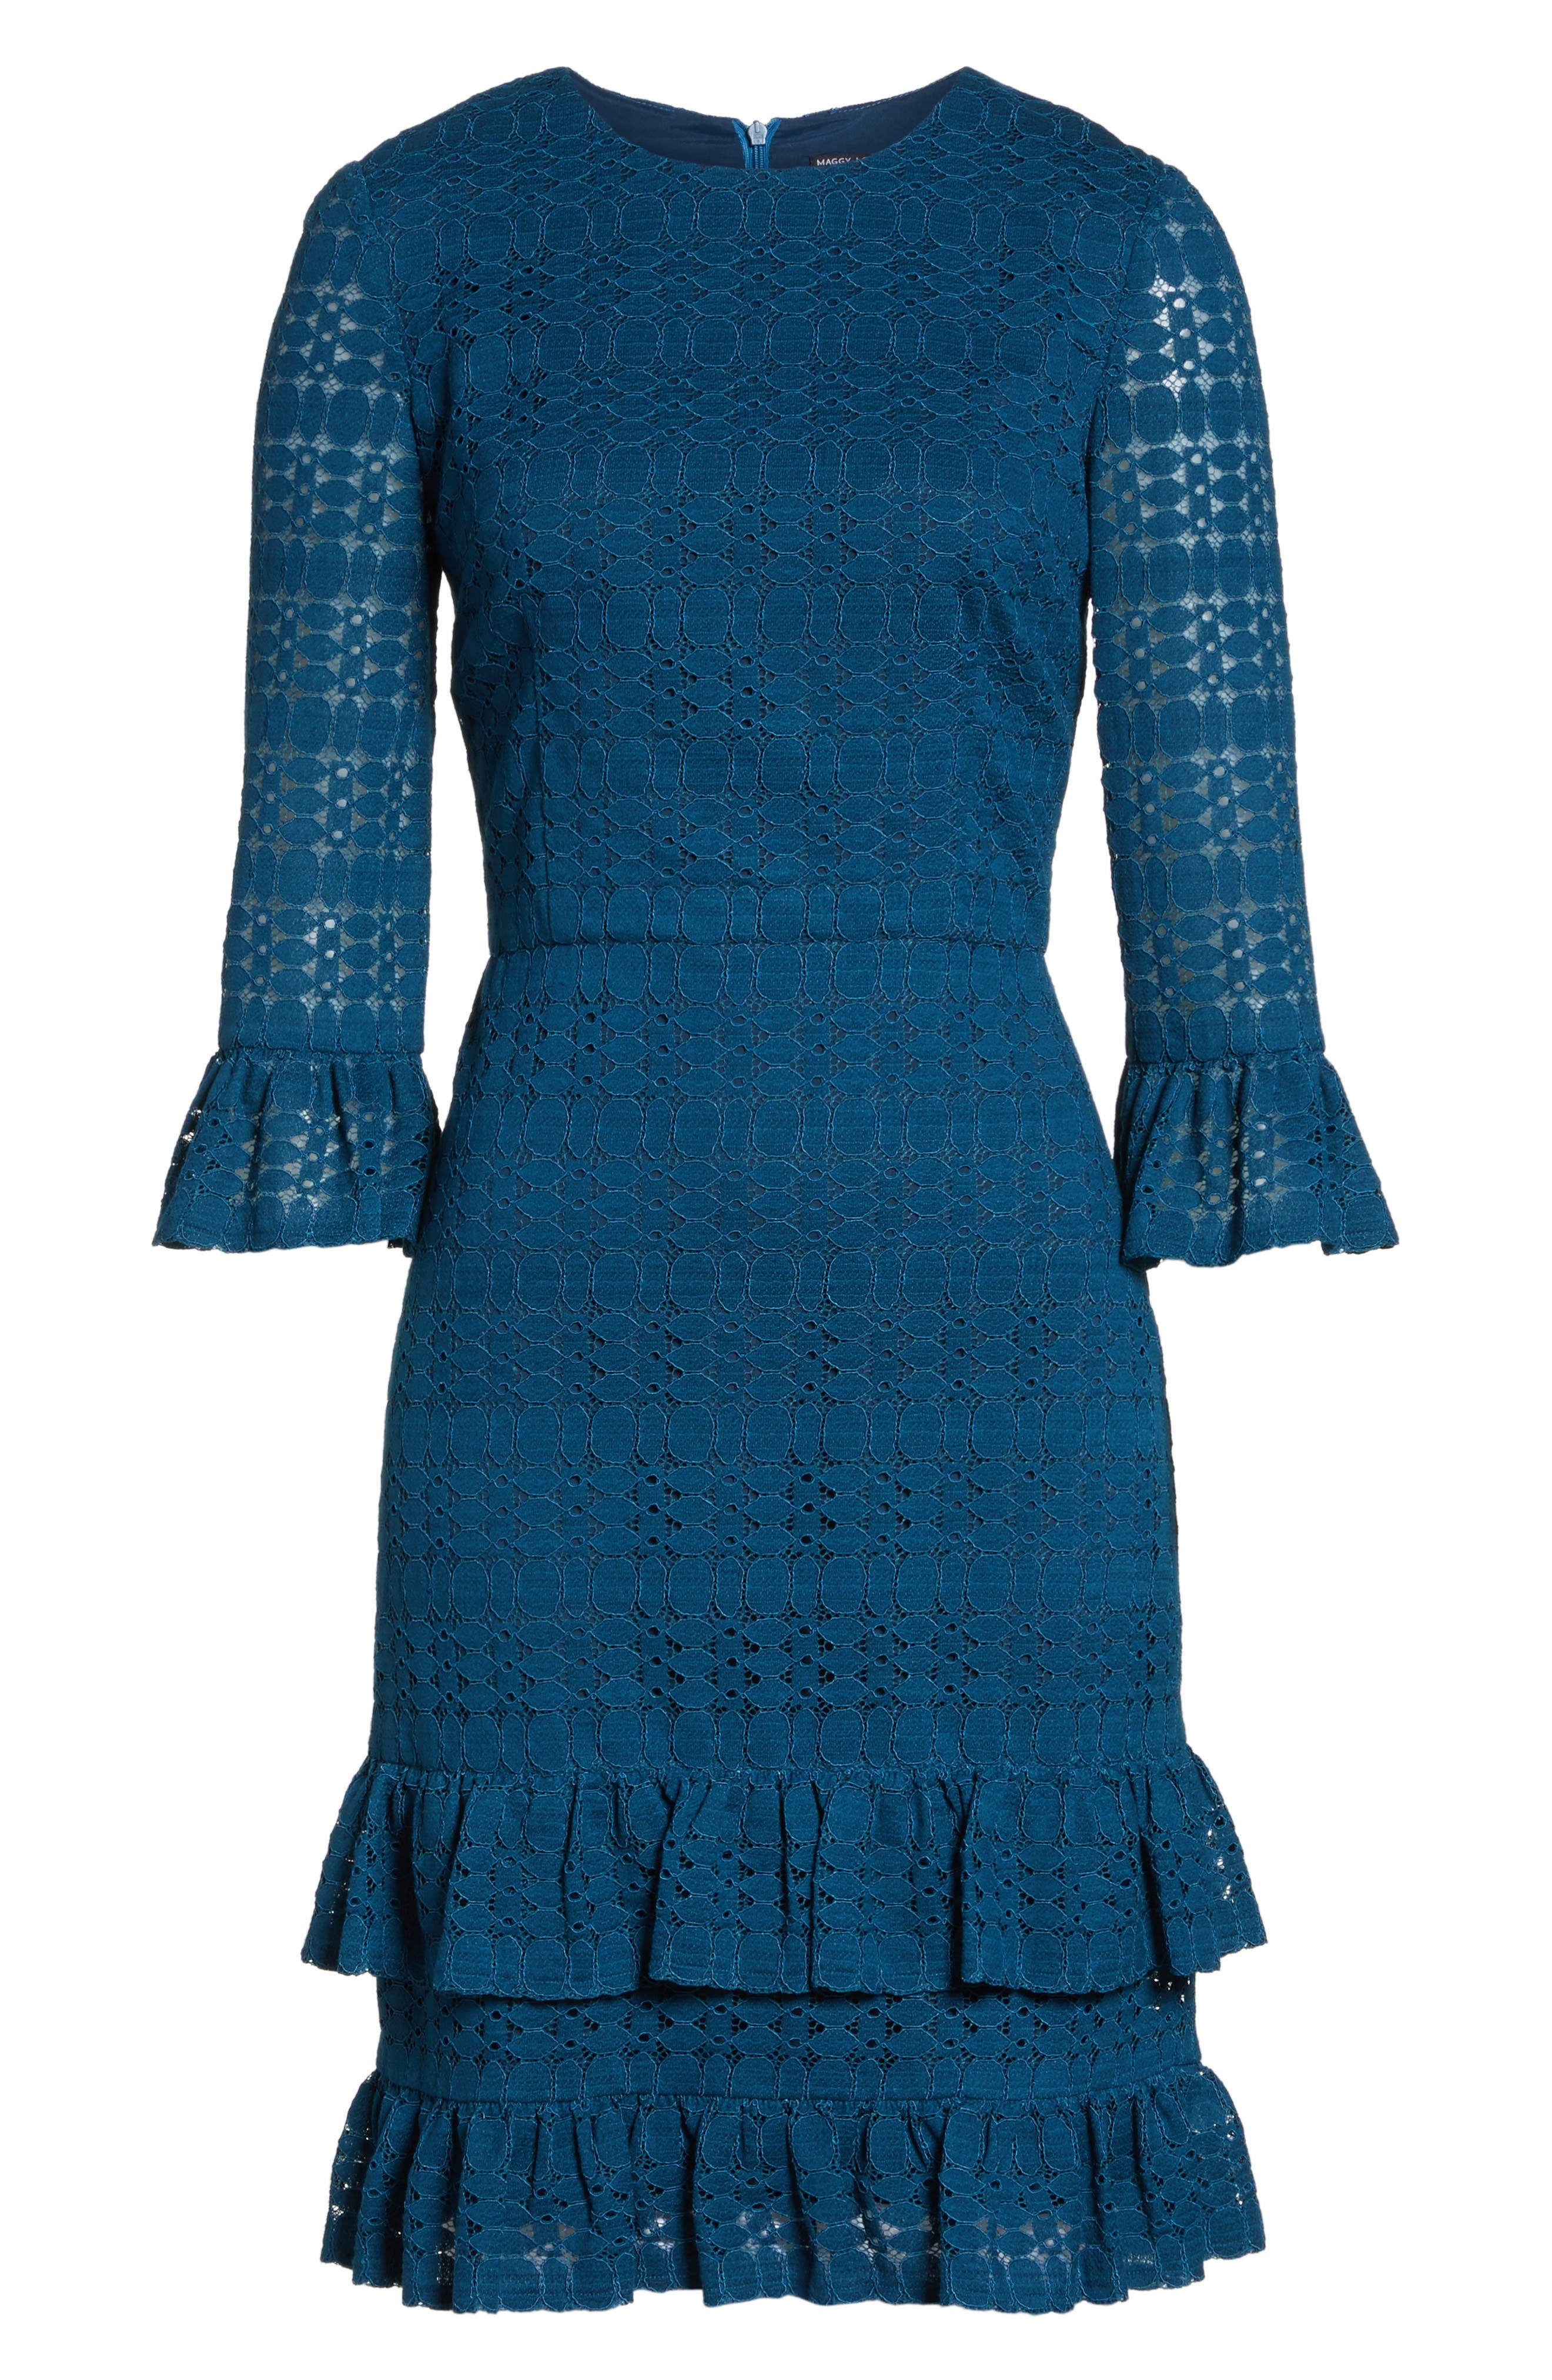 Ruffle Lace Sheath Dress,                             Alternate thumbnail 6, color,                             458